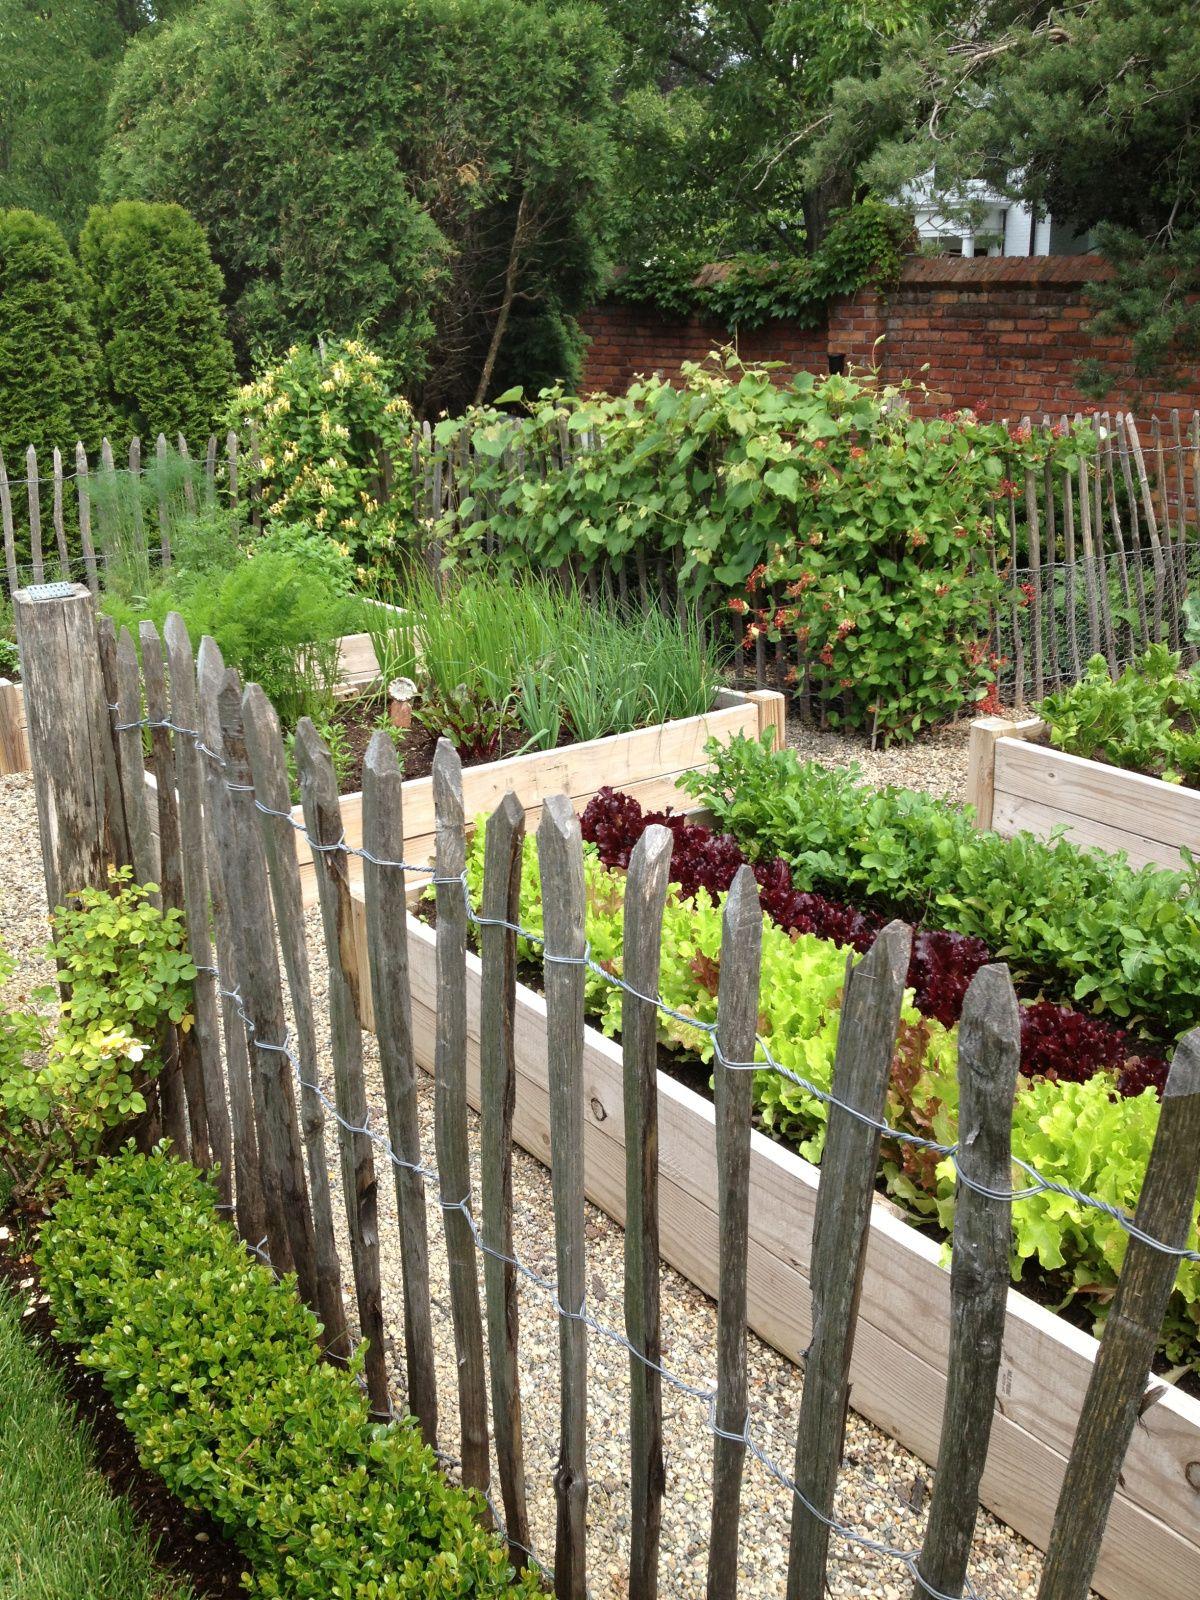 Veggie garden inspiration  vegetable garden inspiration  Secret Garden  Pinterest  Garden